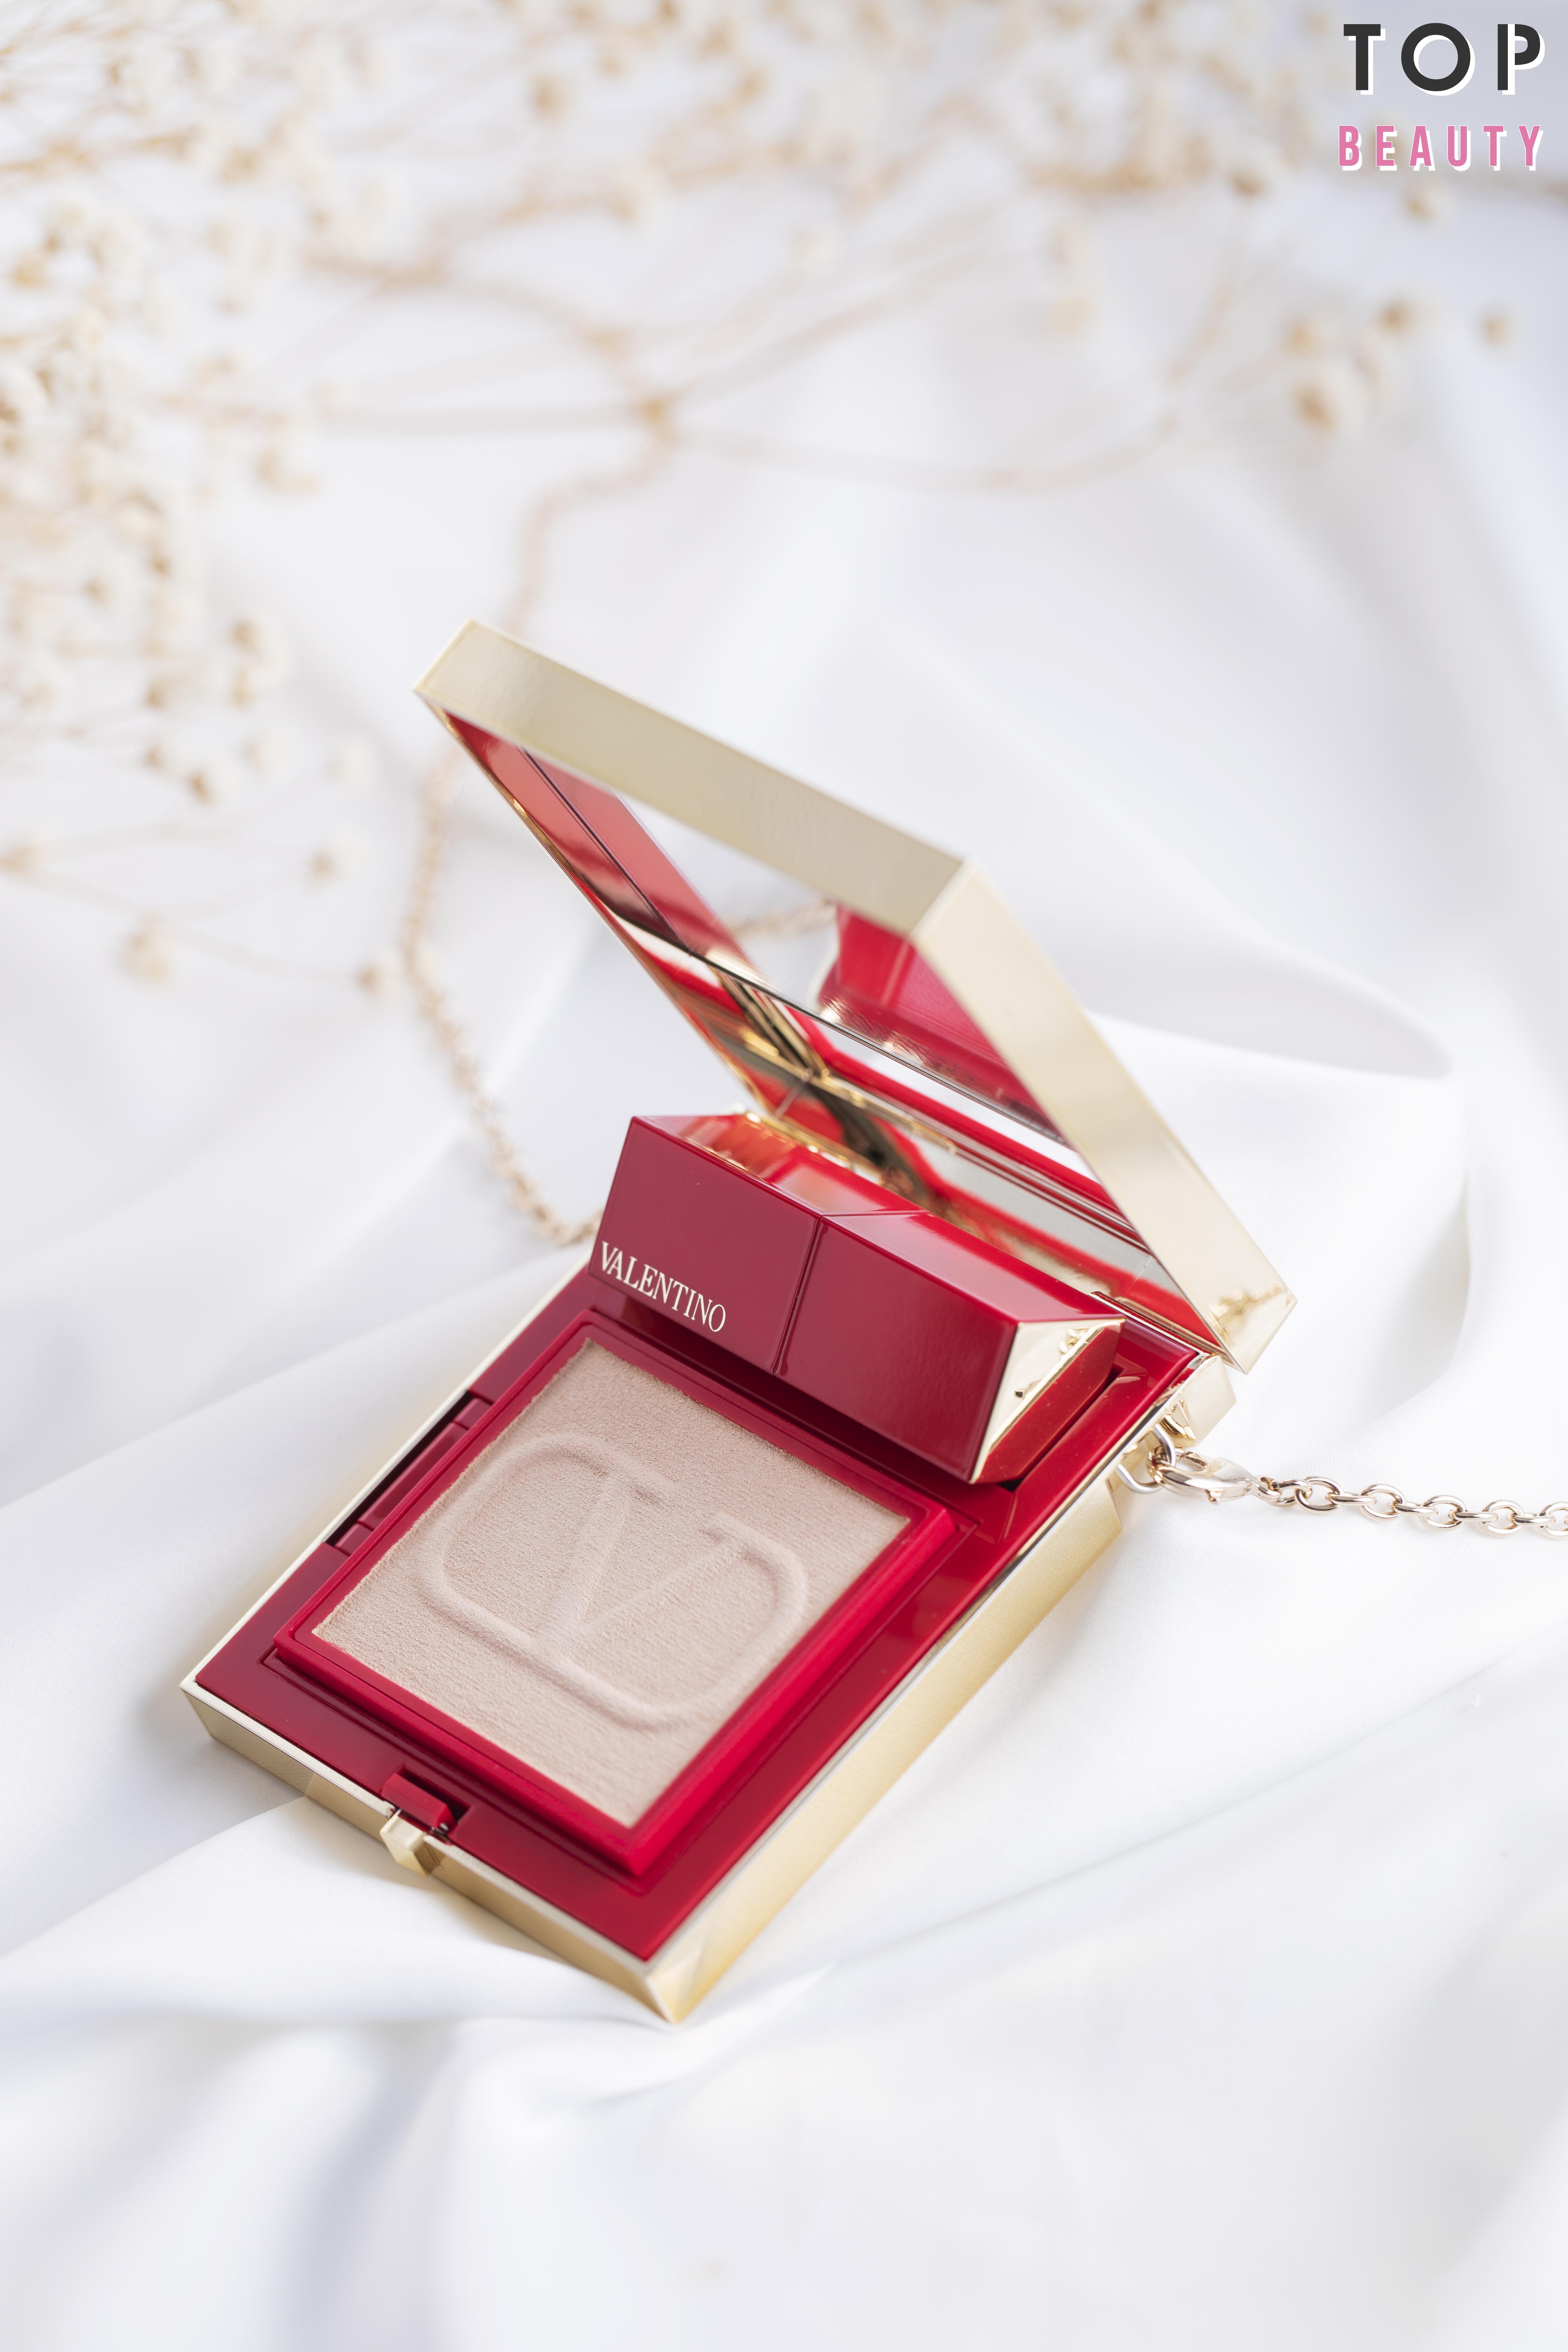 Valentino Beauty Go-Clutch 高訂隨行彩妝鏡盒外型超時尚。